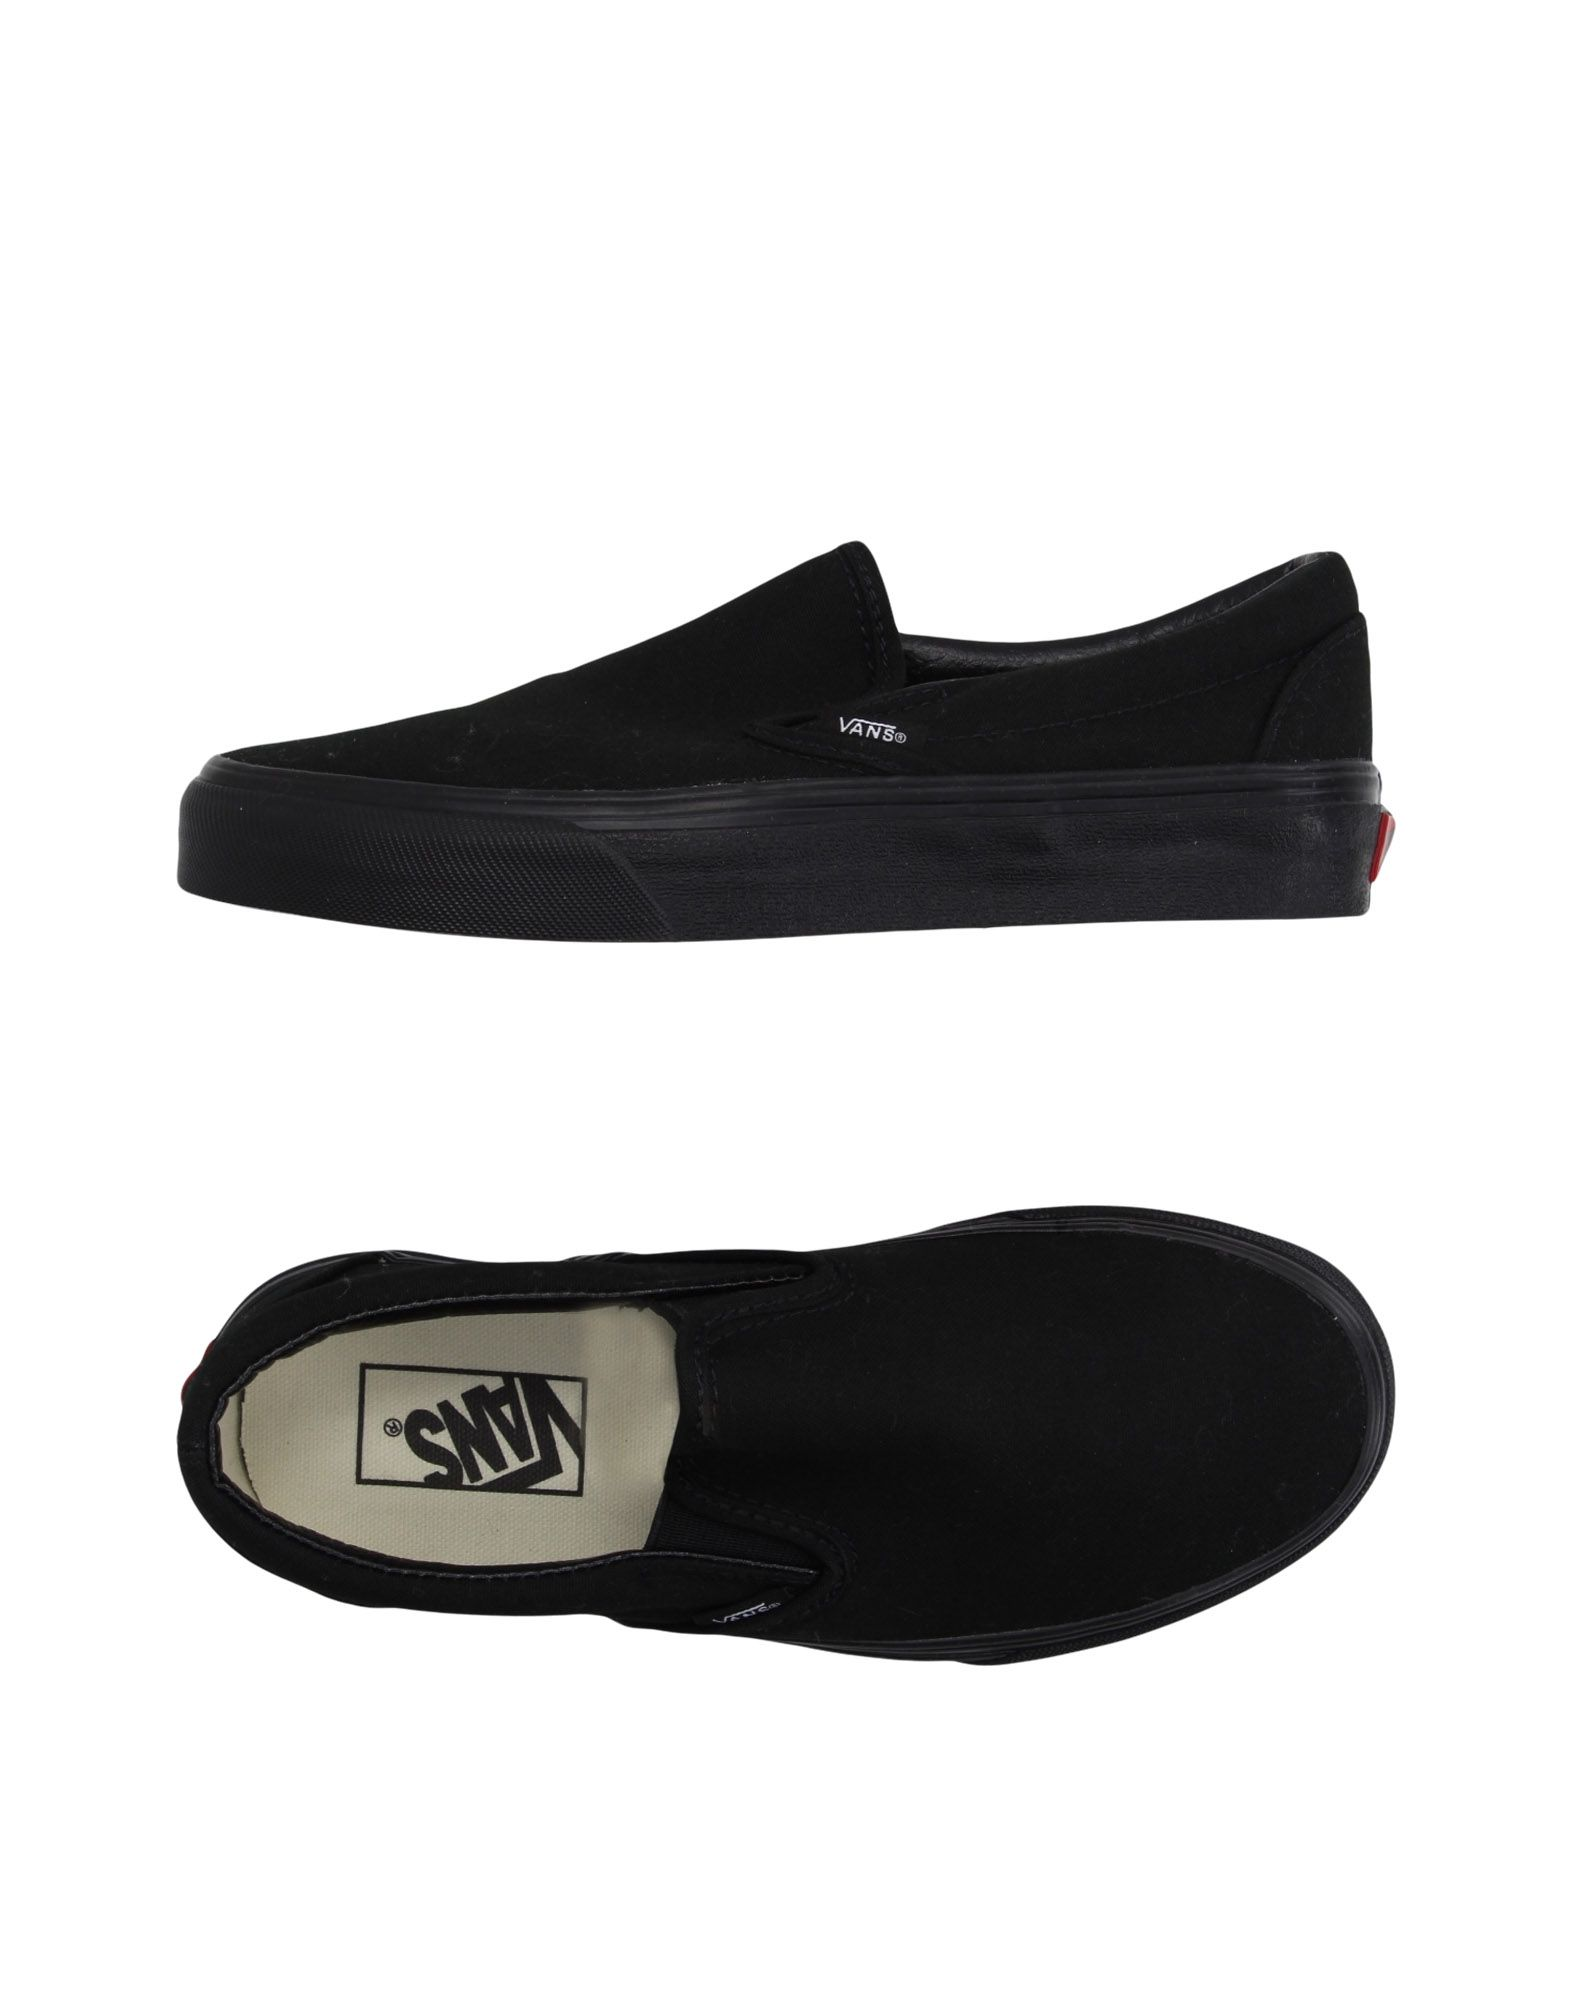 Vans Sneakers Damen  11362868ON Gute Qualität beliebte Schuhe